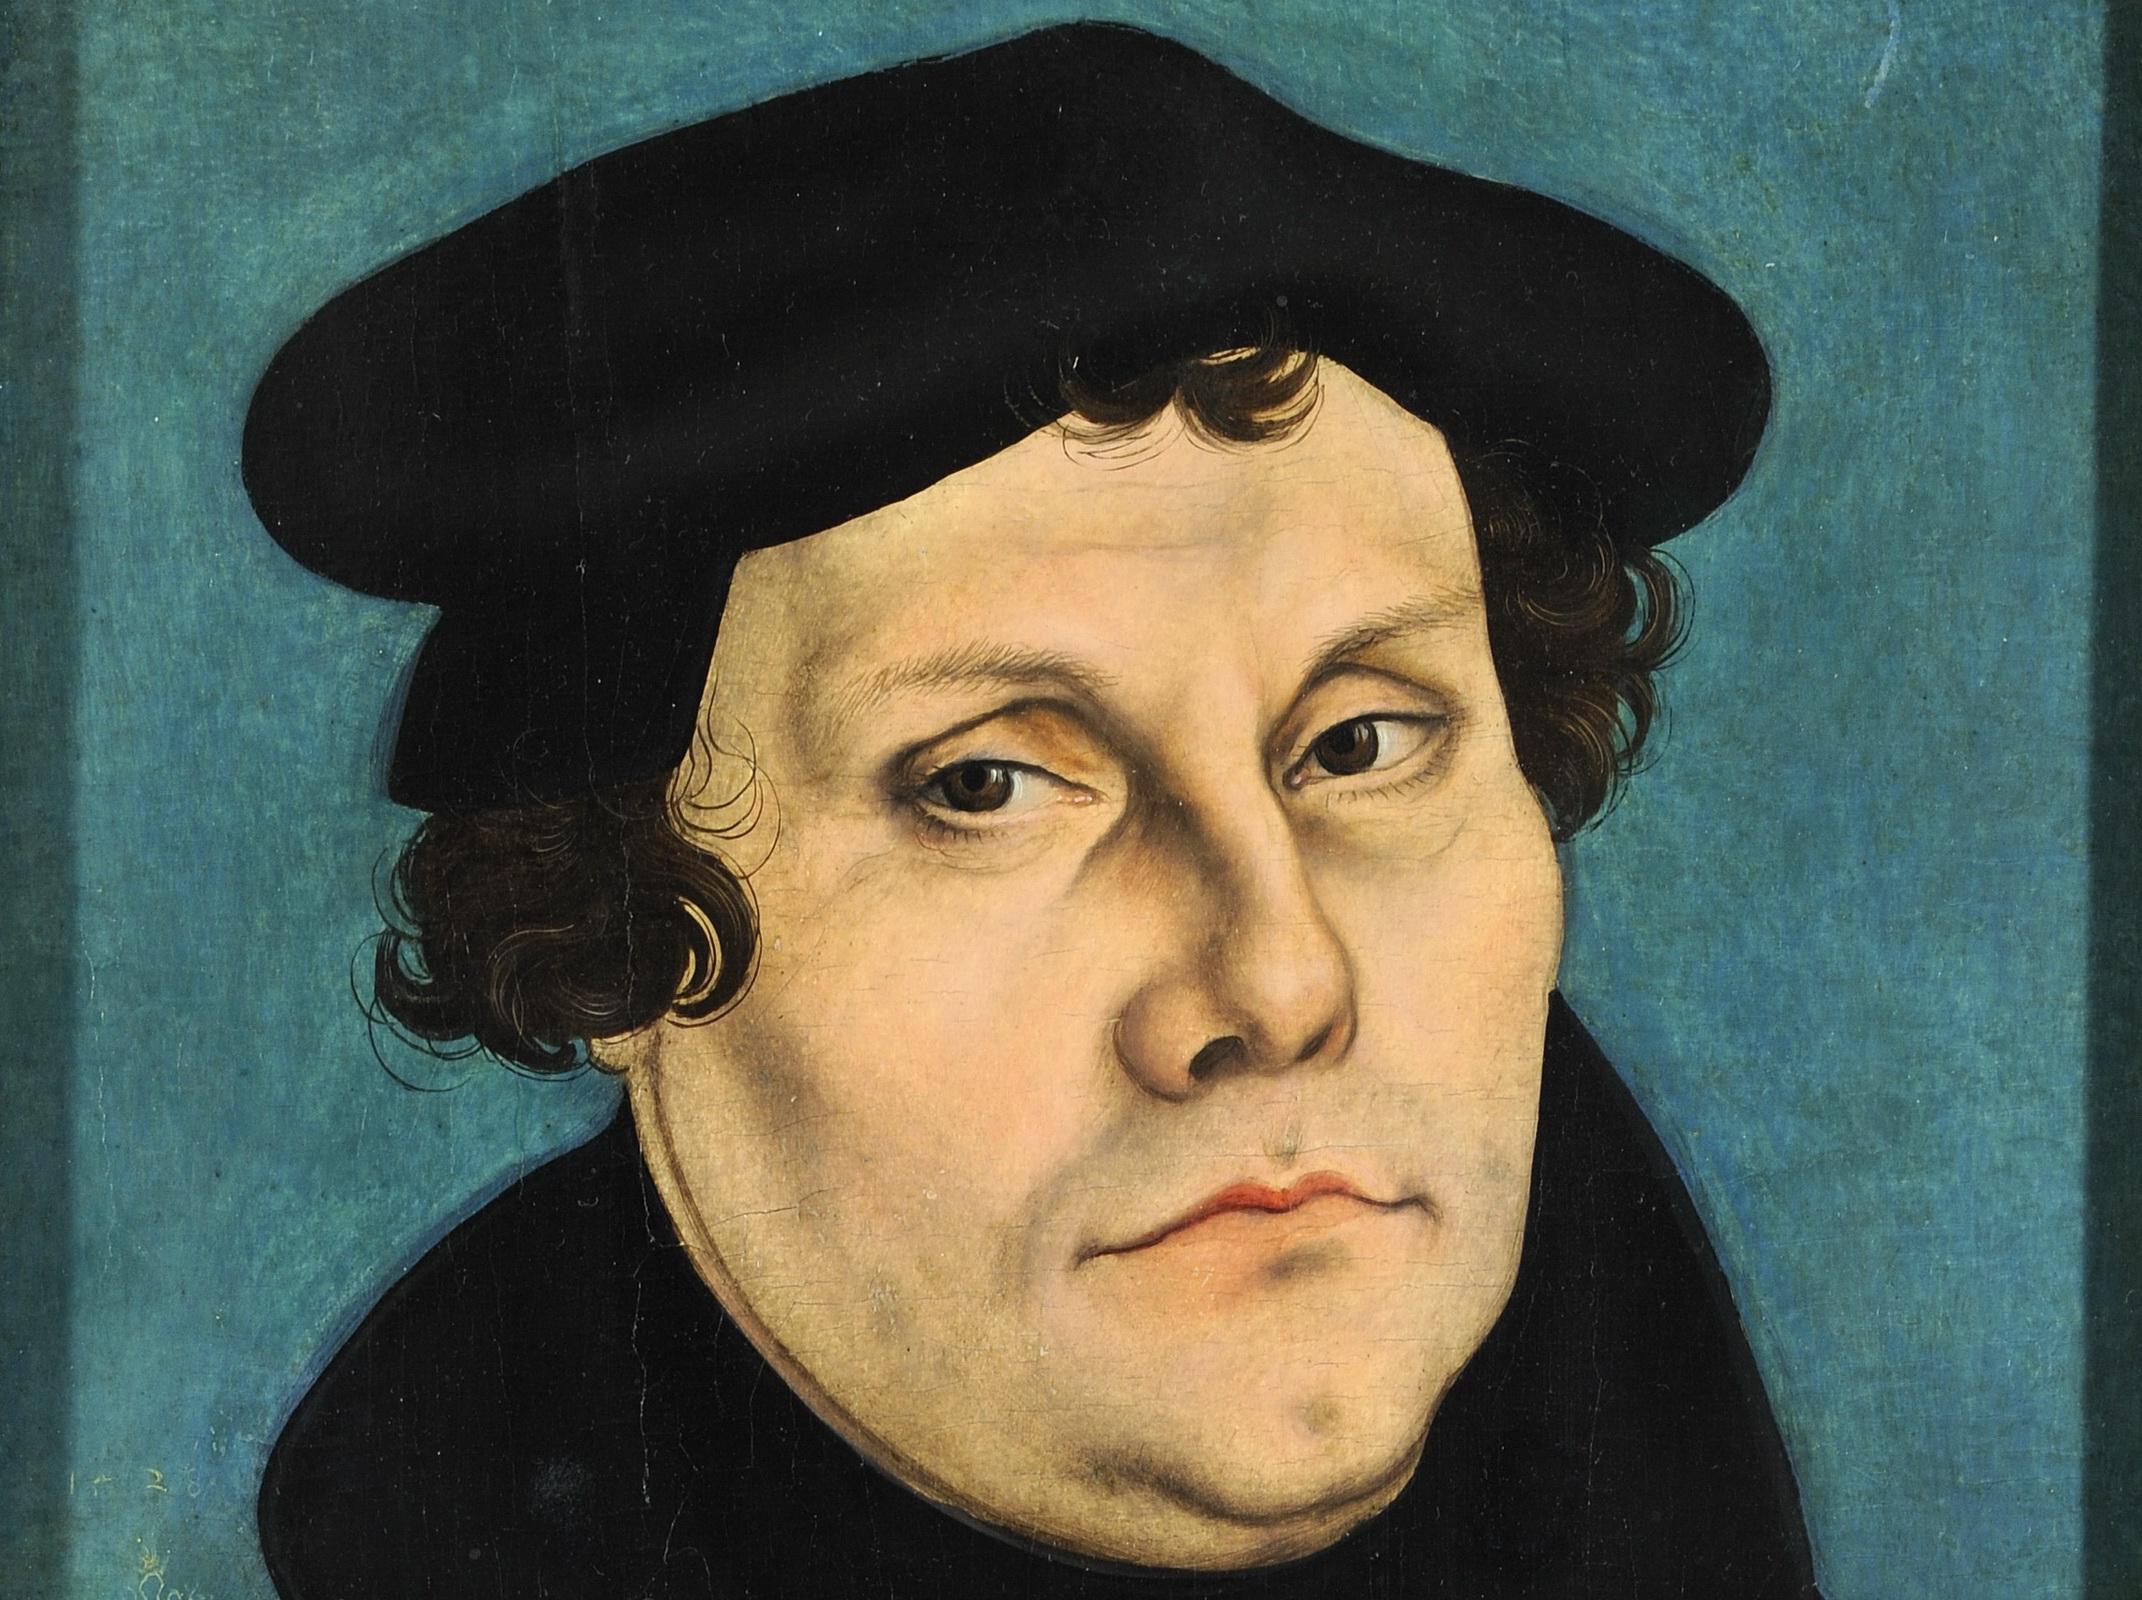 Lucas Cranach: Martin Luther